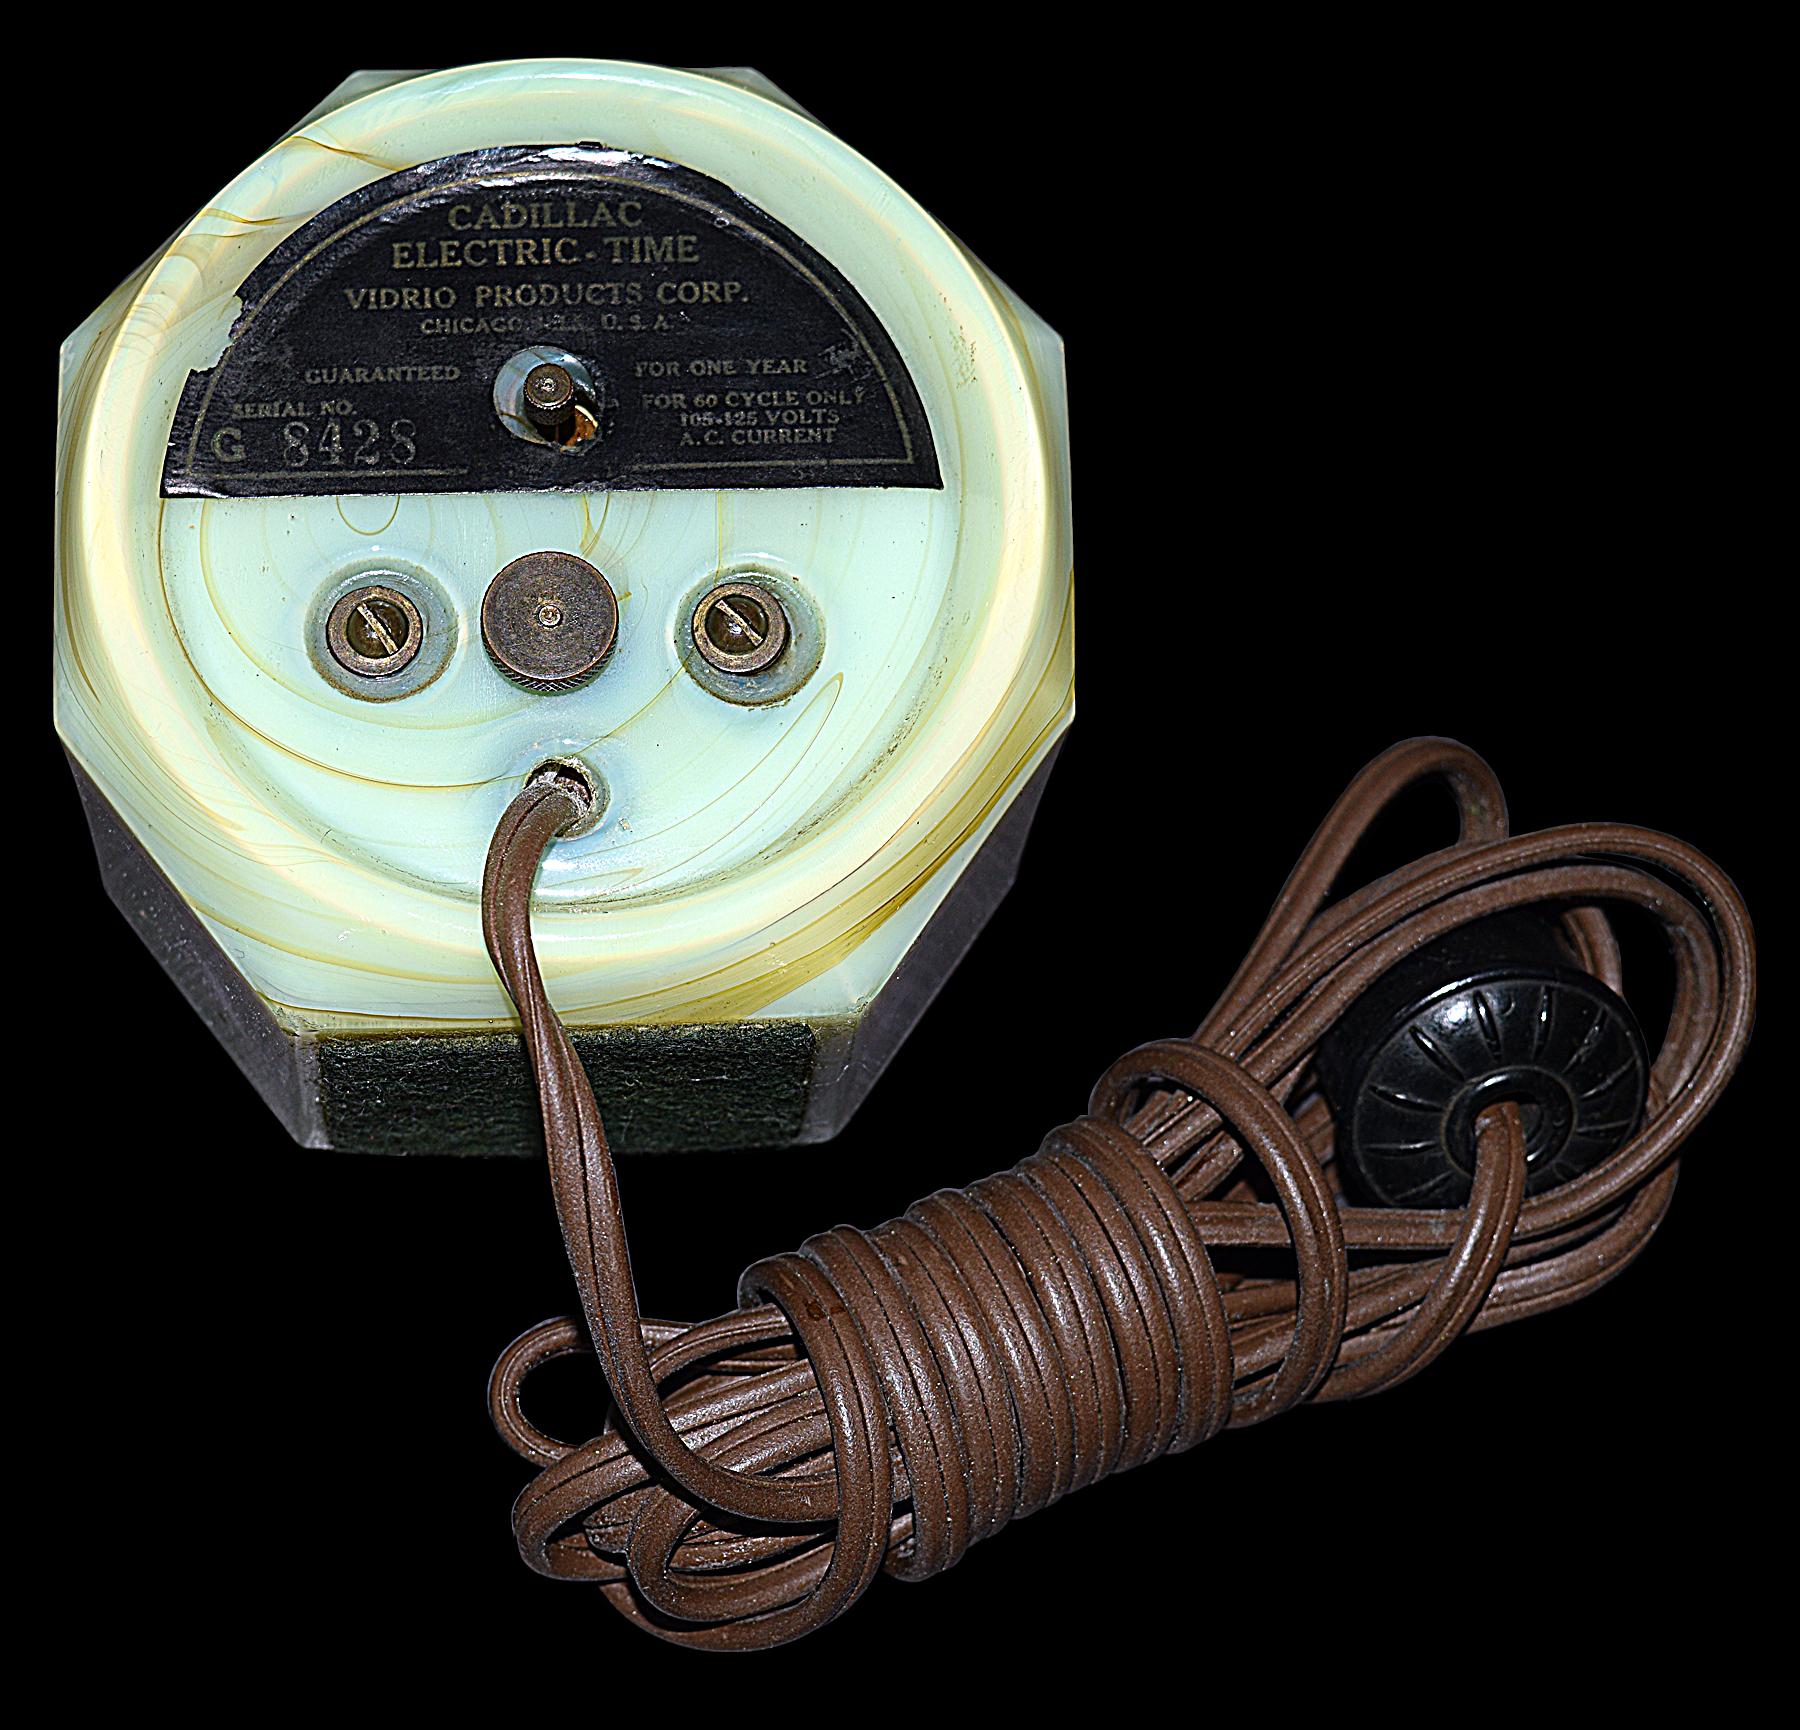 Vidrio Electric Time Clock Timer Back